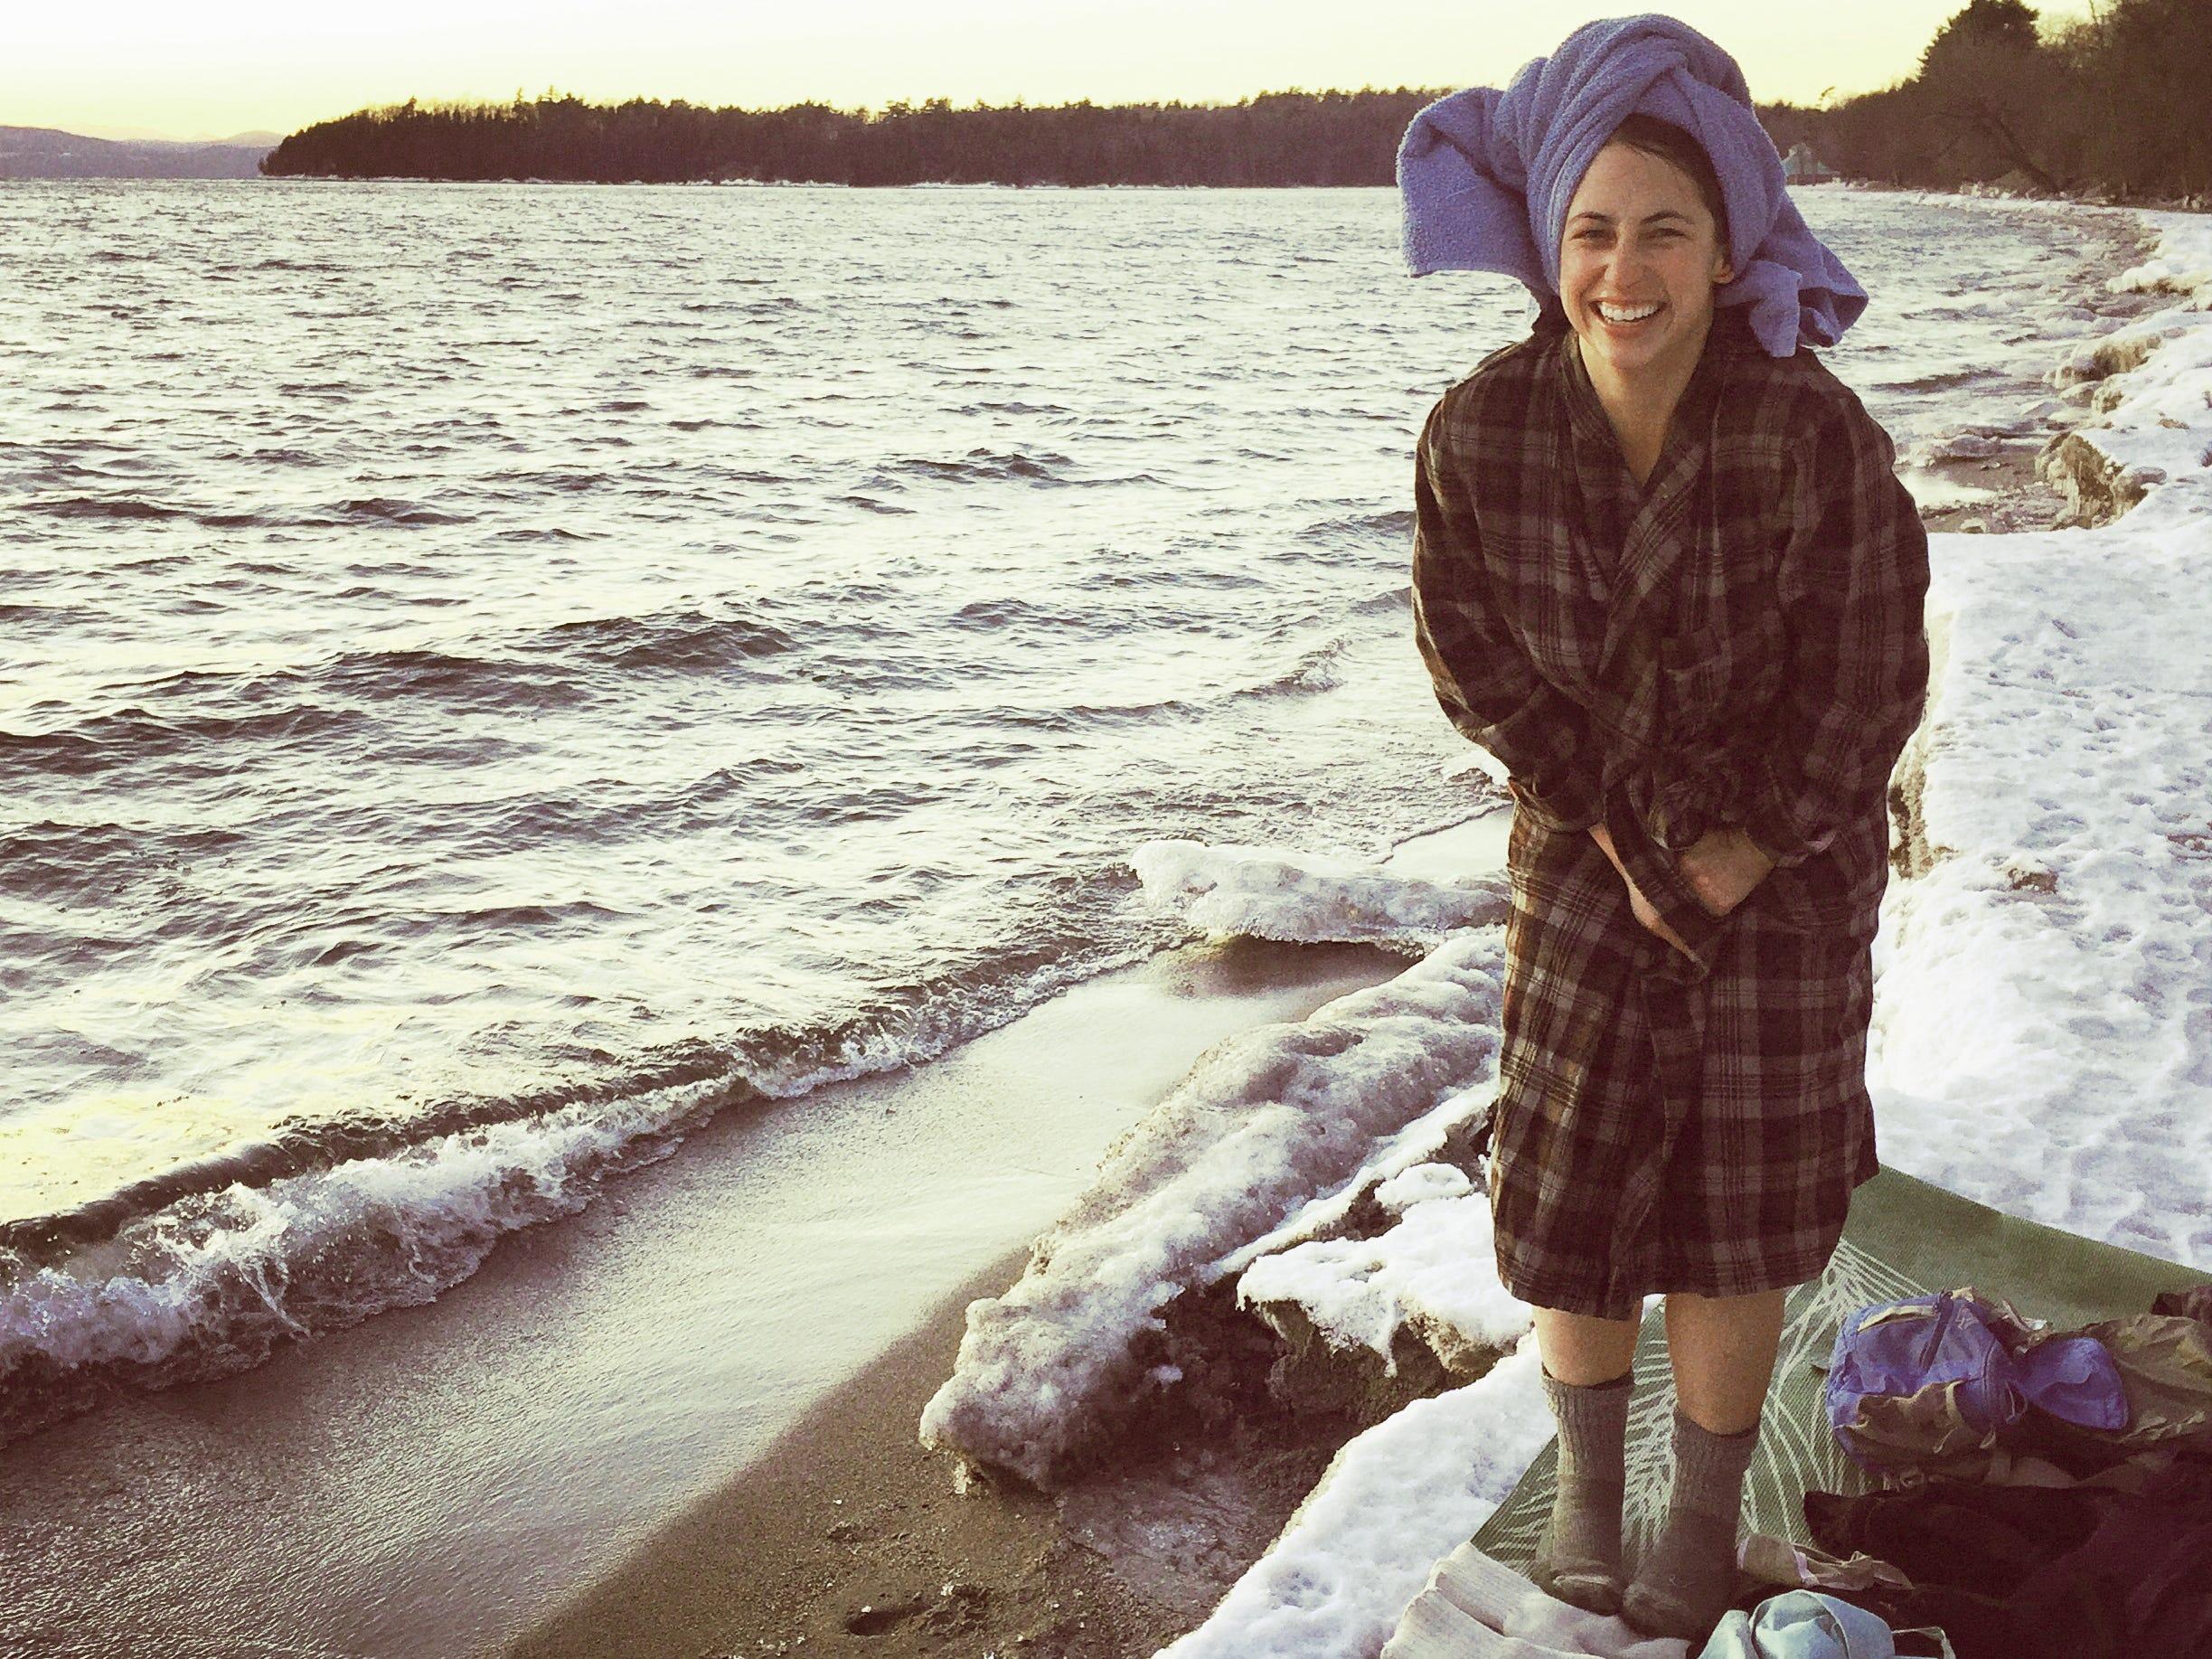 Elise Schadler bundles up after having taken a quick dip in Lake Champlain on Jan. 20, 2015.